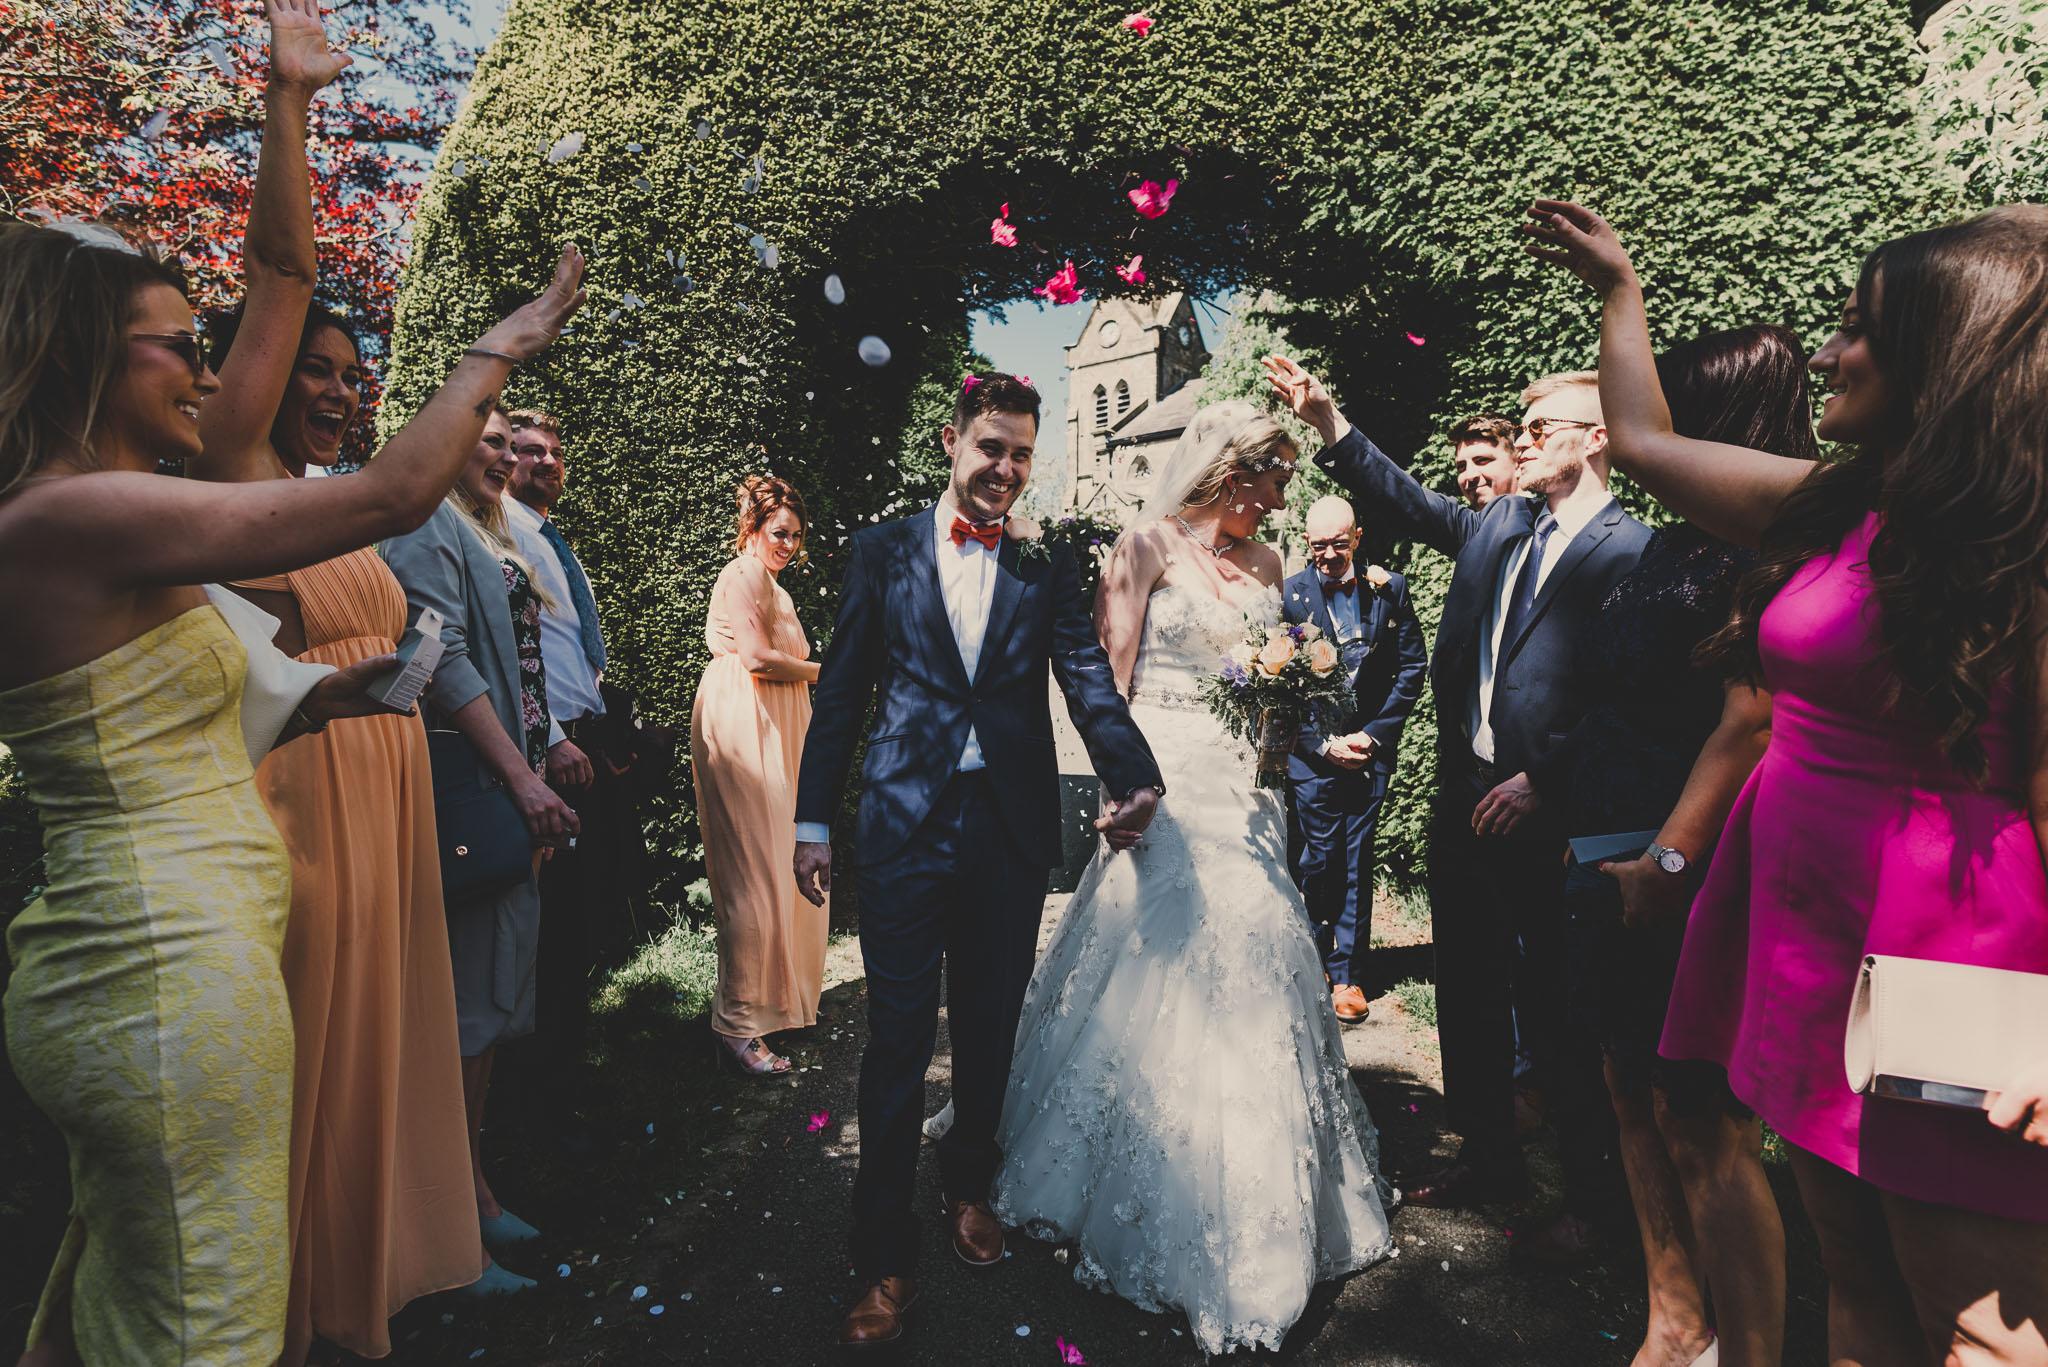 2 romantic and intimate wedding phtography (31).jpg